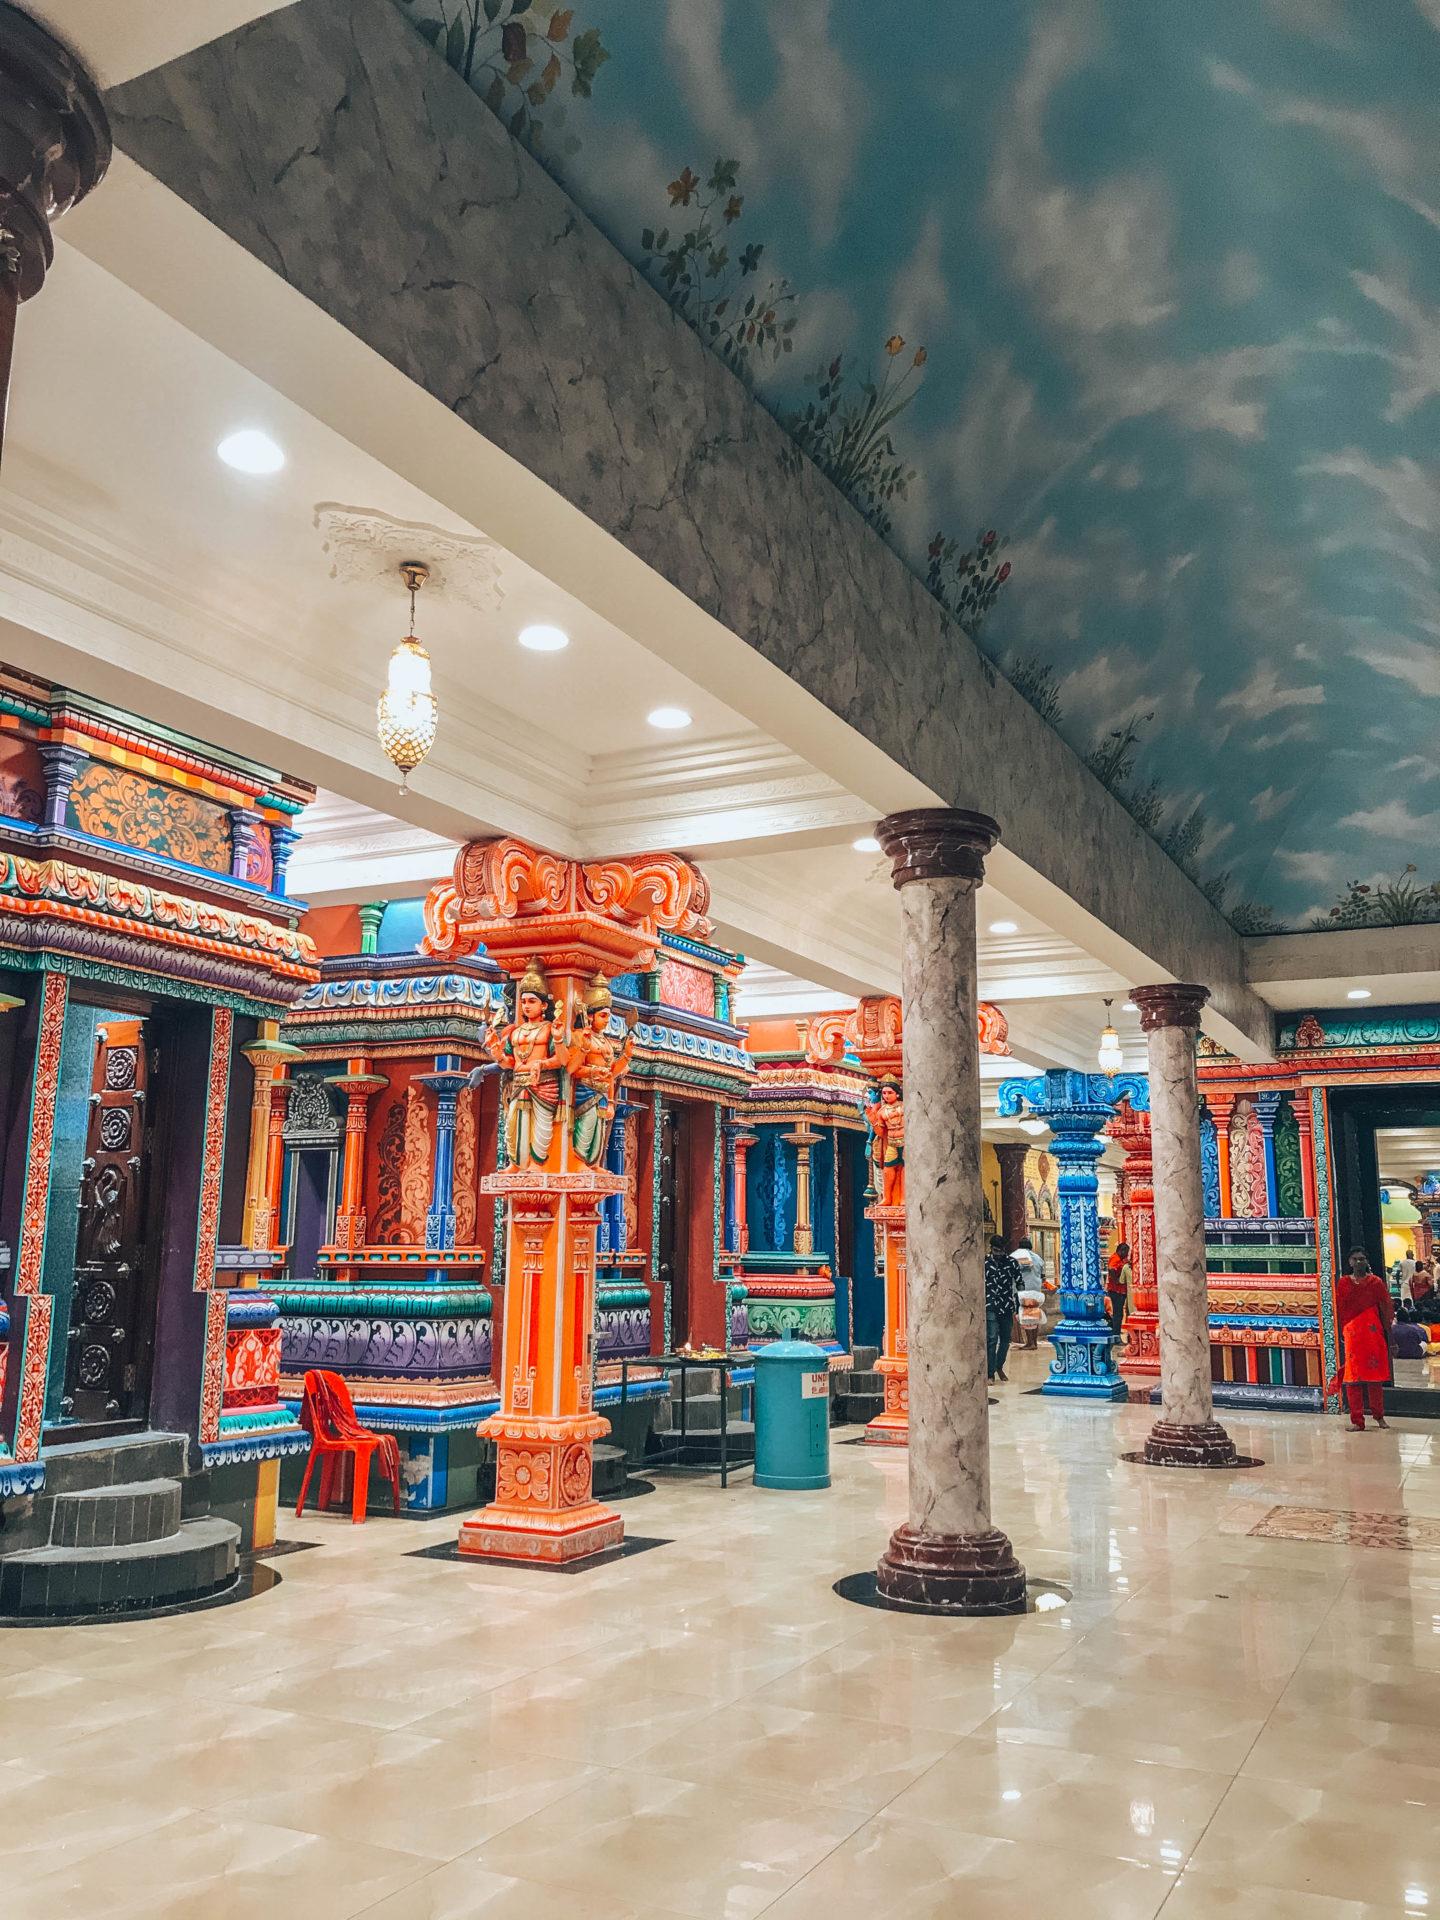 Inside of the Batu Caves temples in Kuala Lumpur